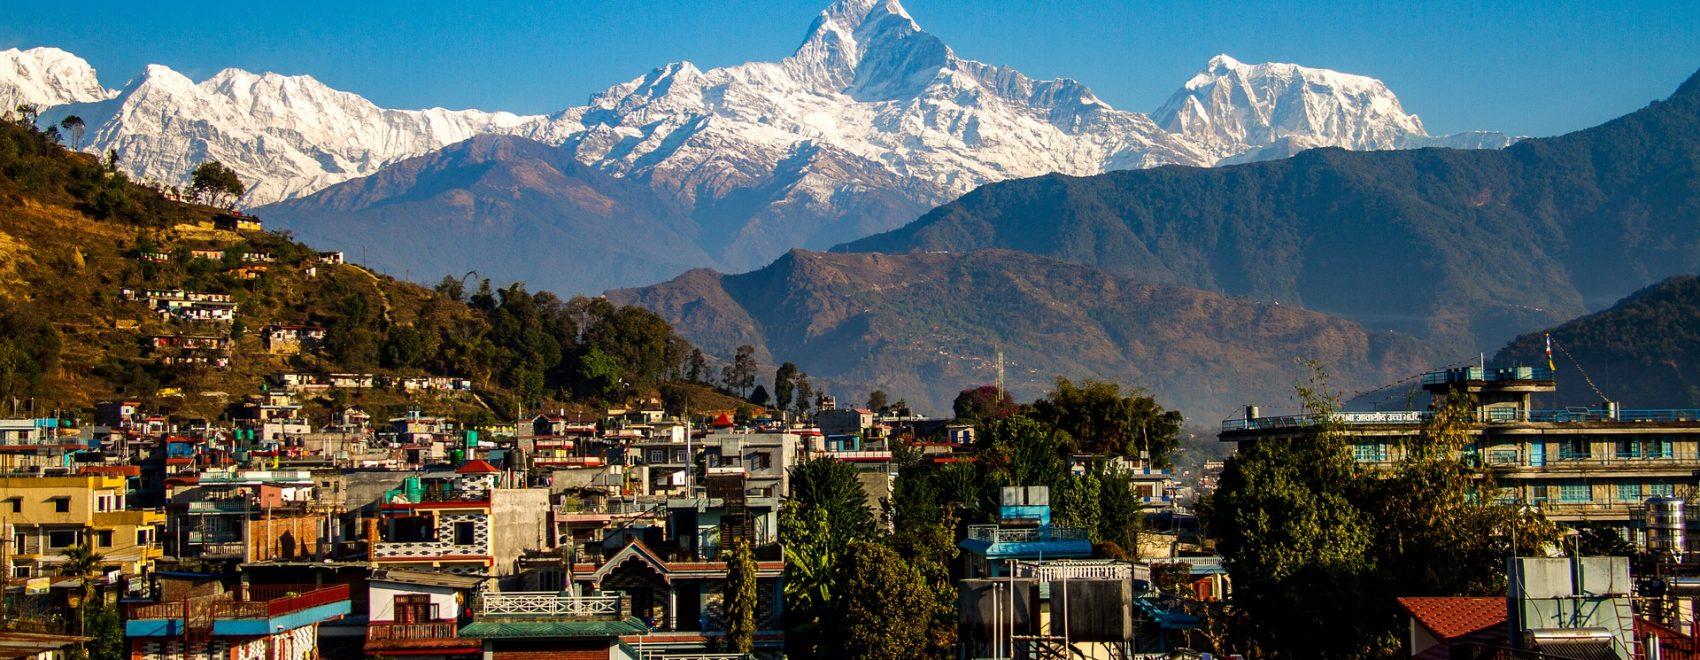 3 star hotels in pokhara, nepal